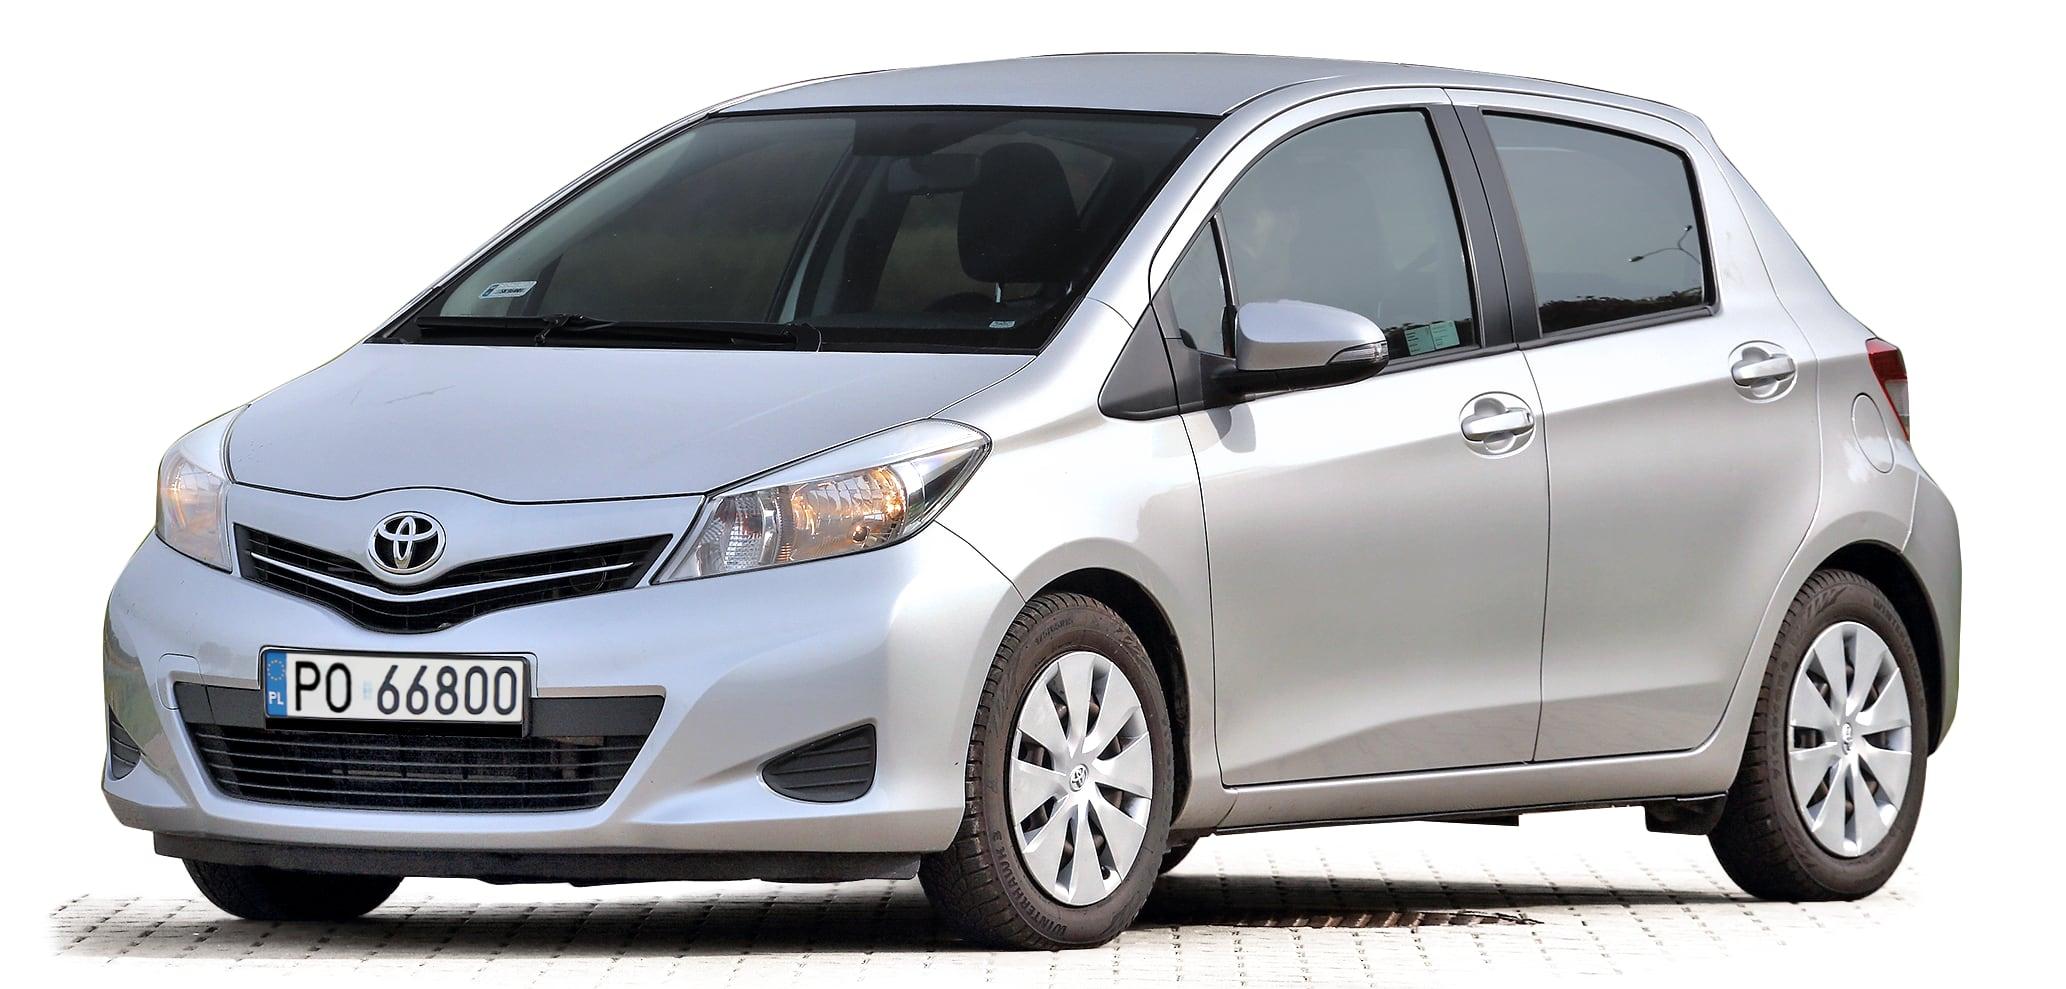 Toyota-Yaris-III-1.4-D-4D_1